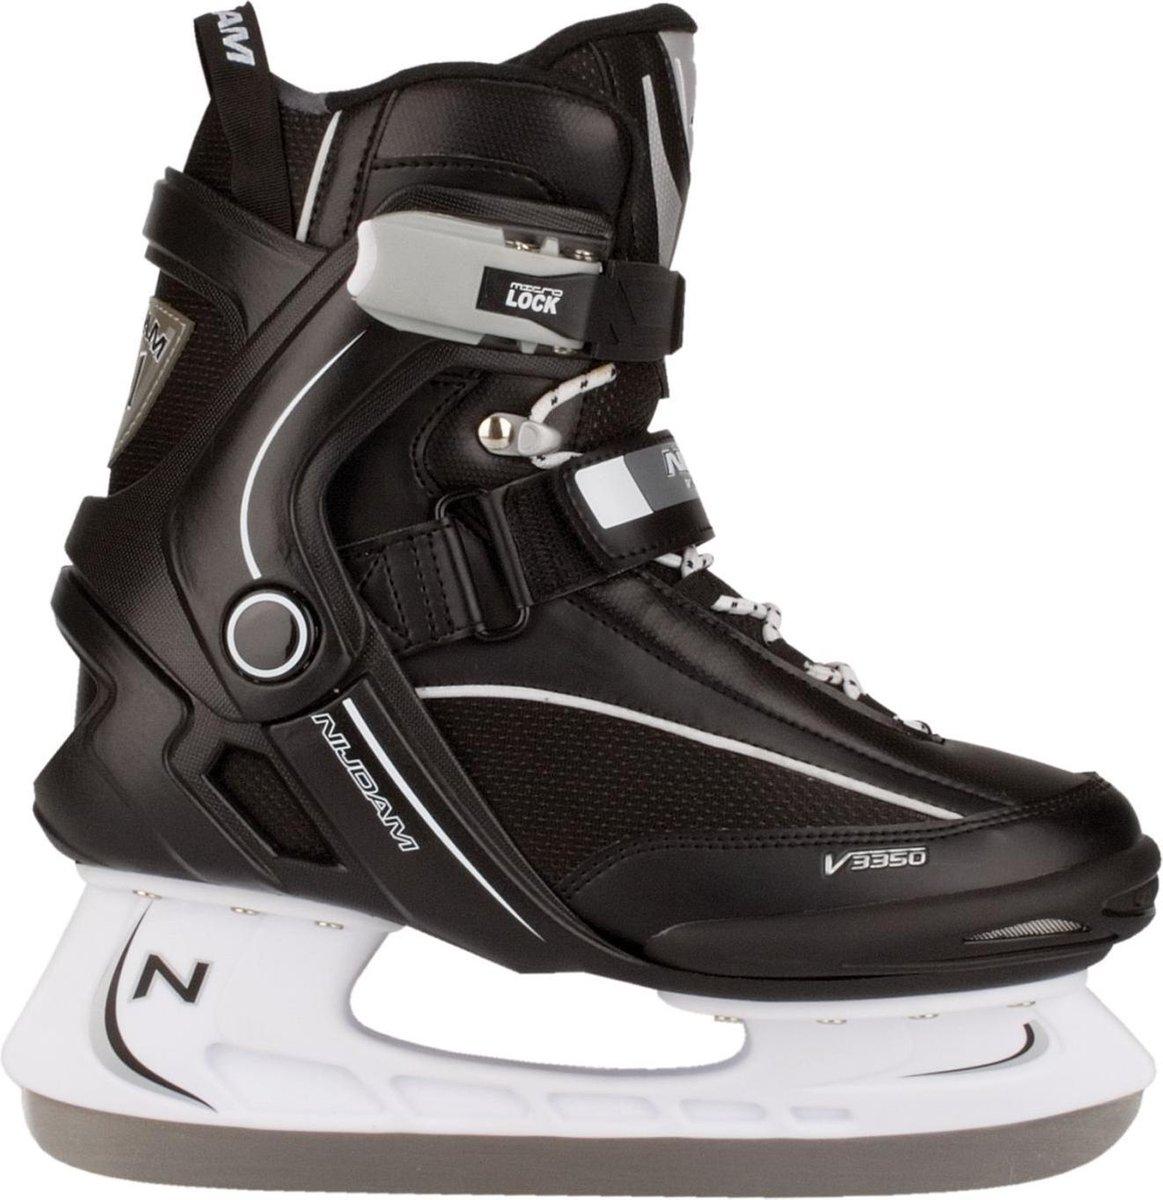 Nijdam IJshockeyschaats - Semi-Softboot - Zwart/Wit - Maat 39